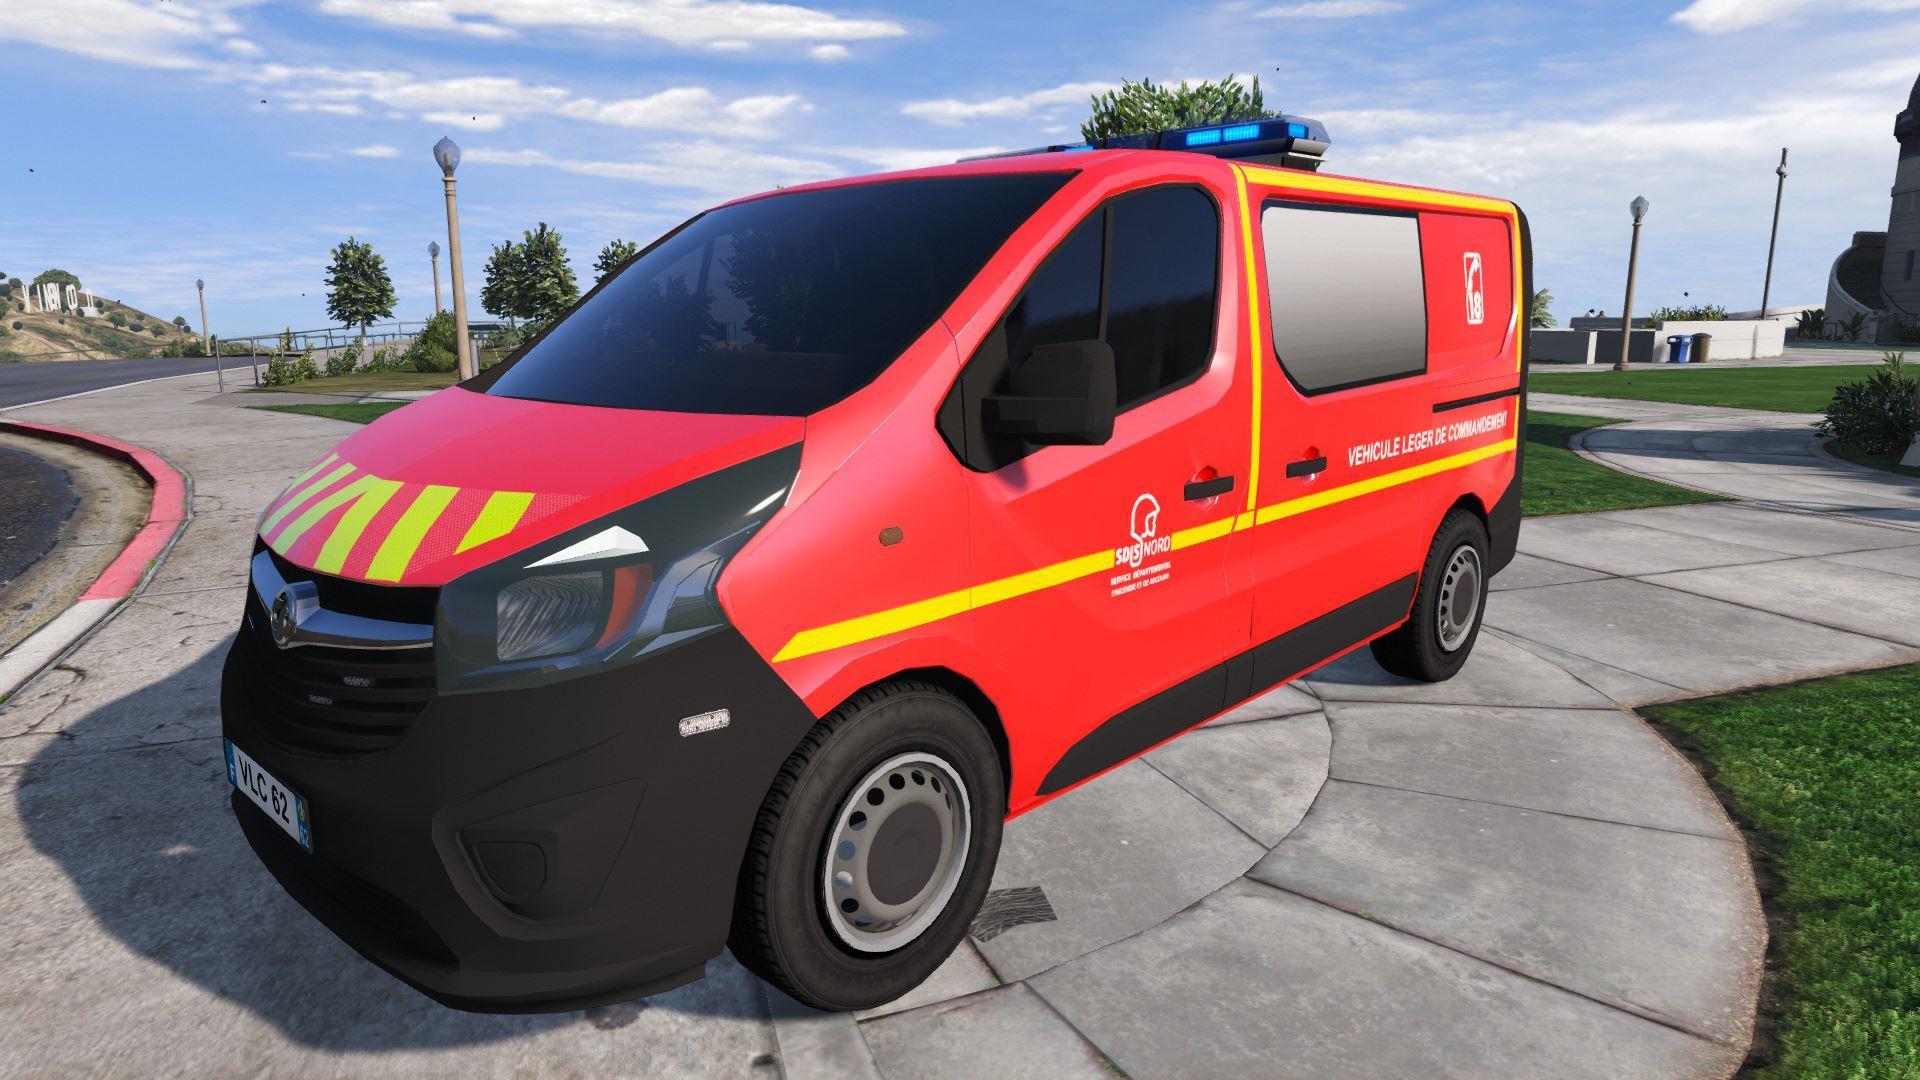 V hicule l ger de commandement gta5 - Image de vehicule ...